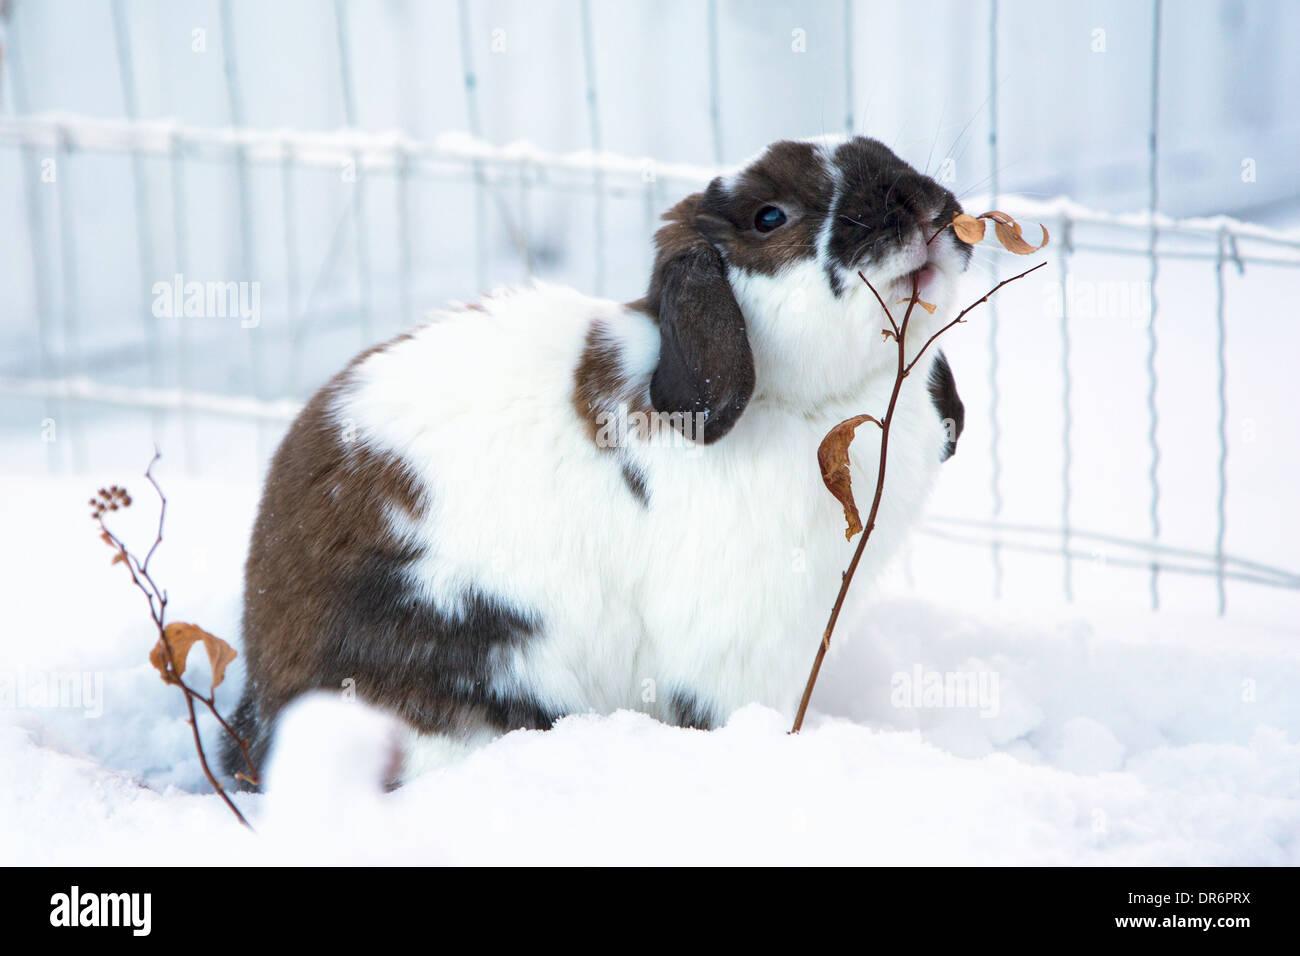 Holland Lop rabbit browsing on shrub in yard - Stock Image